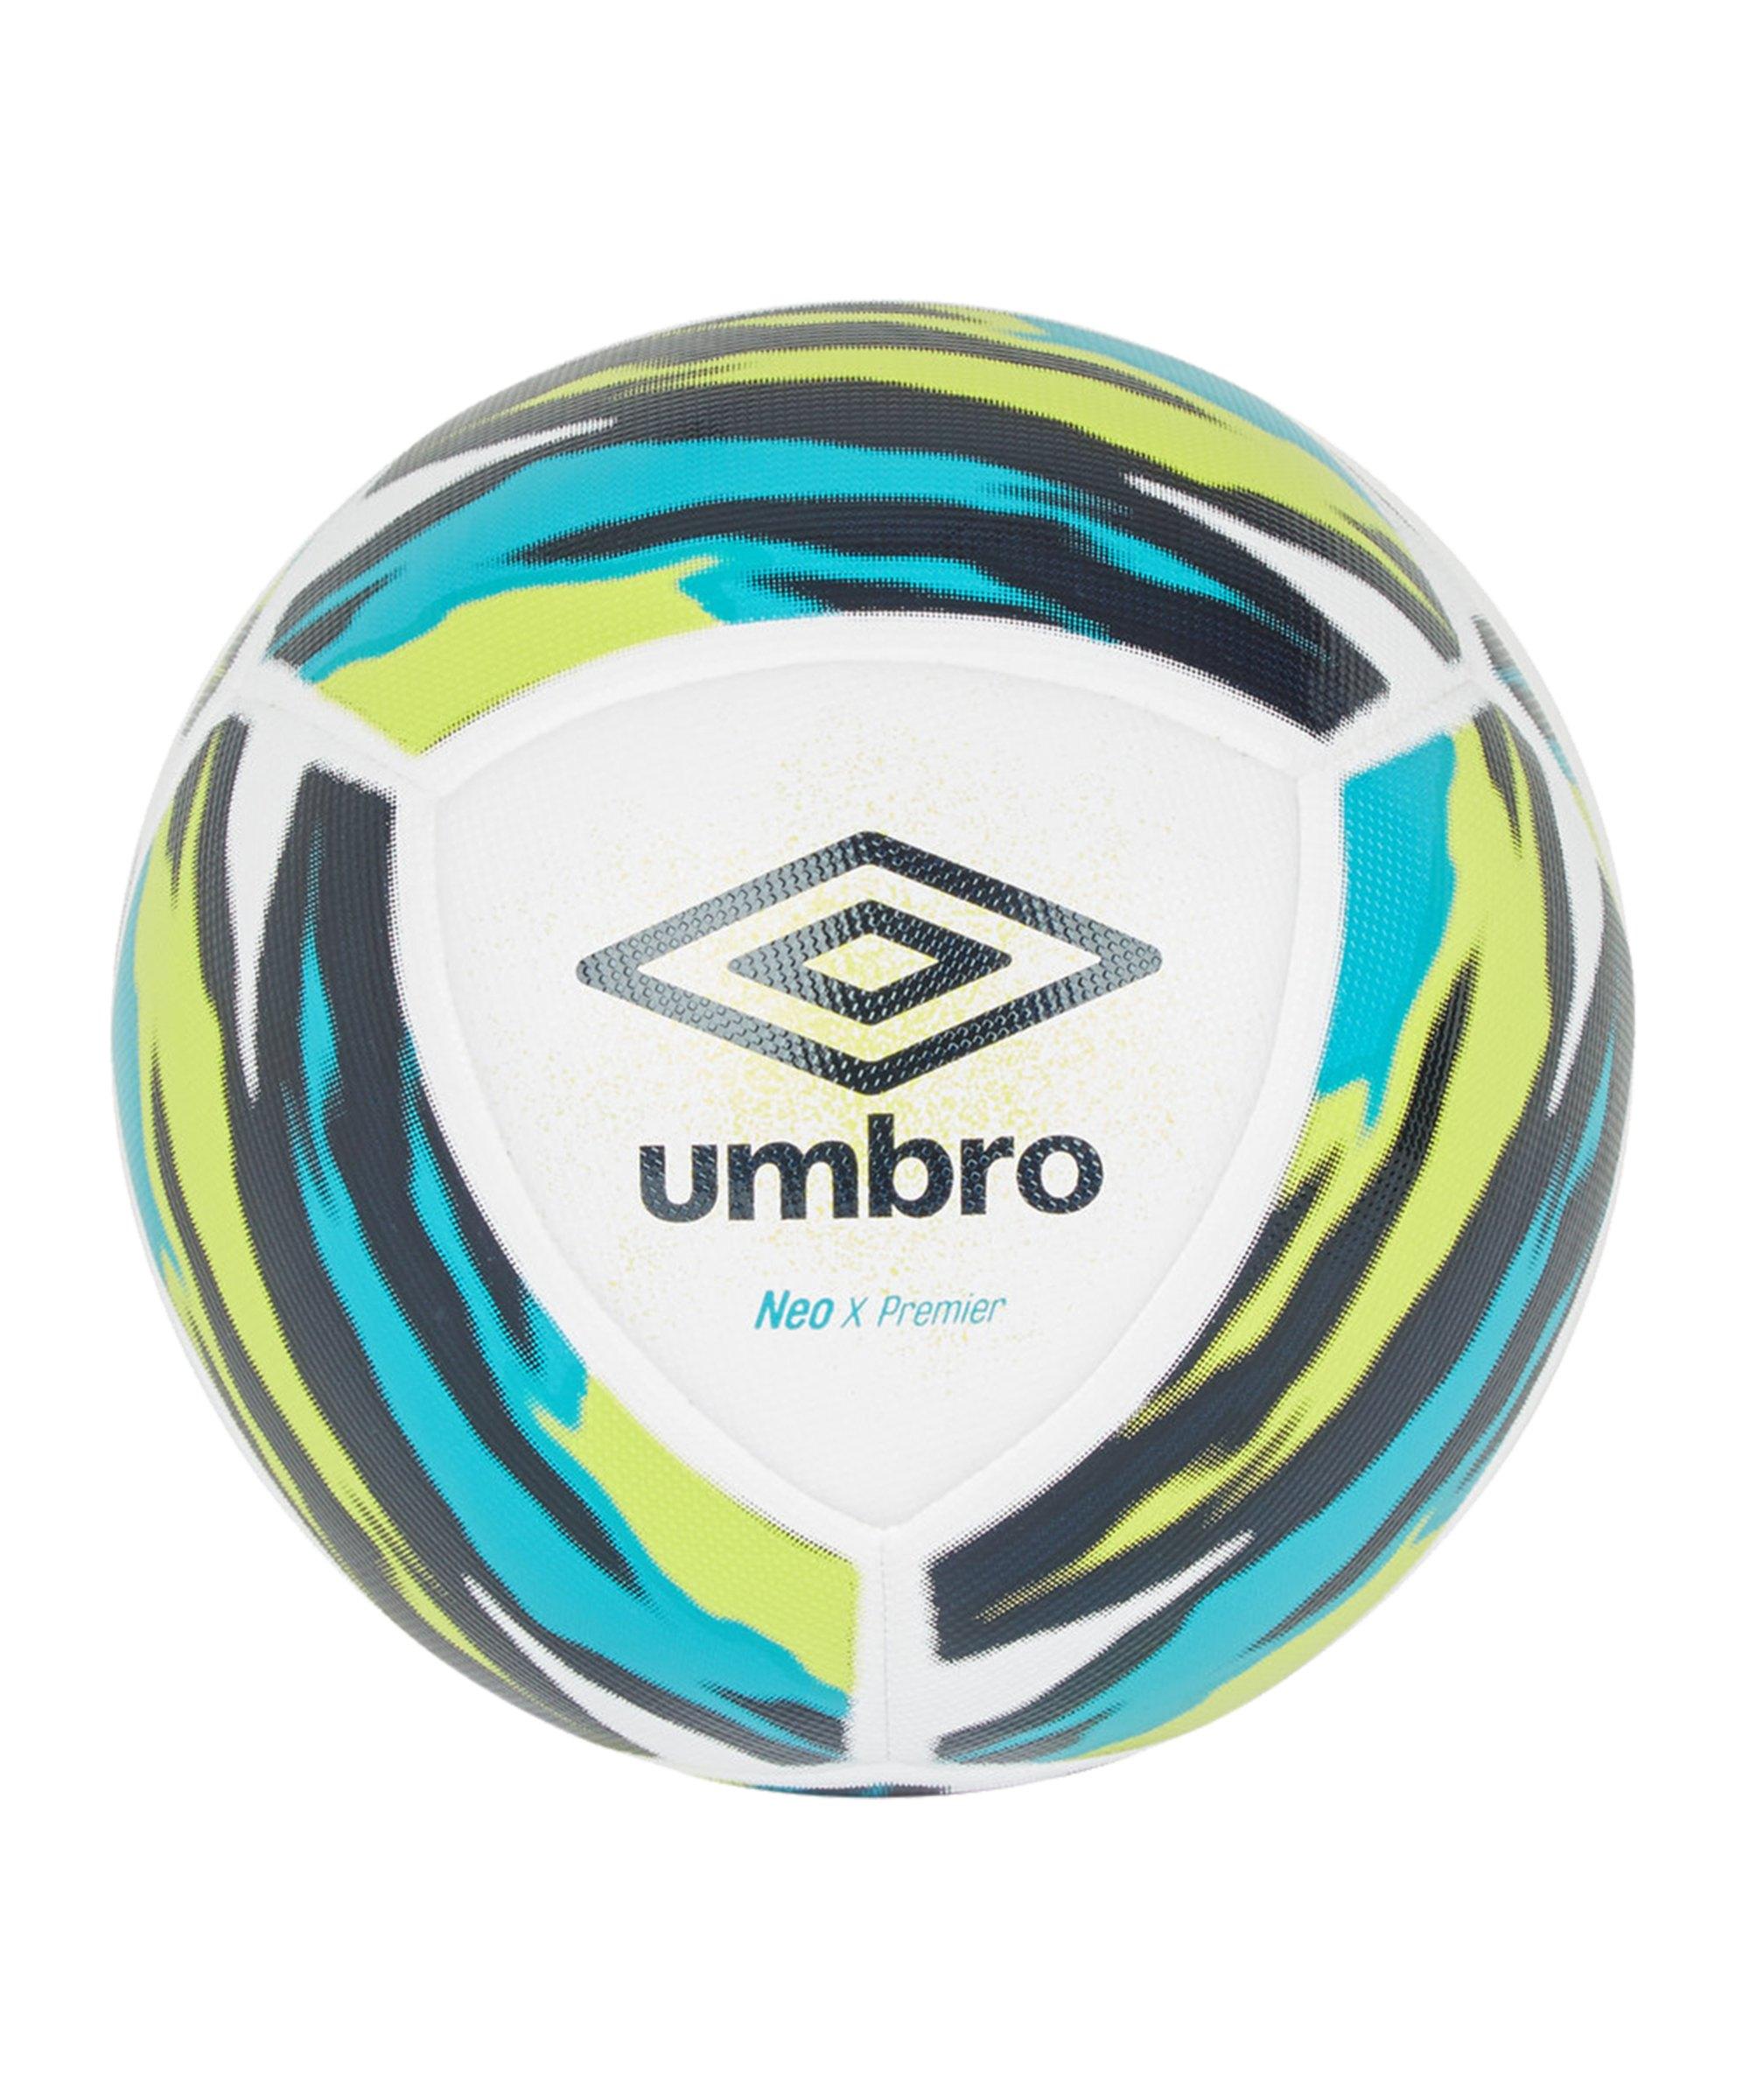 Umbro Neo X Premier Trainingsball Weiss Blau FJPA - weiss